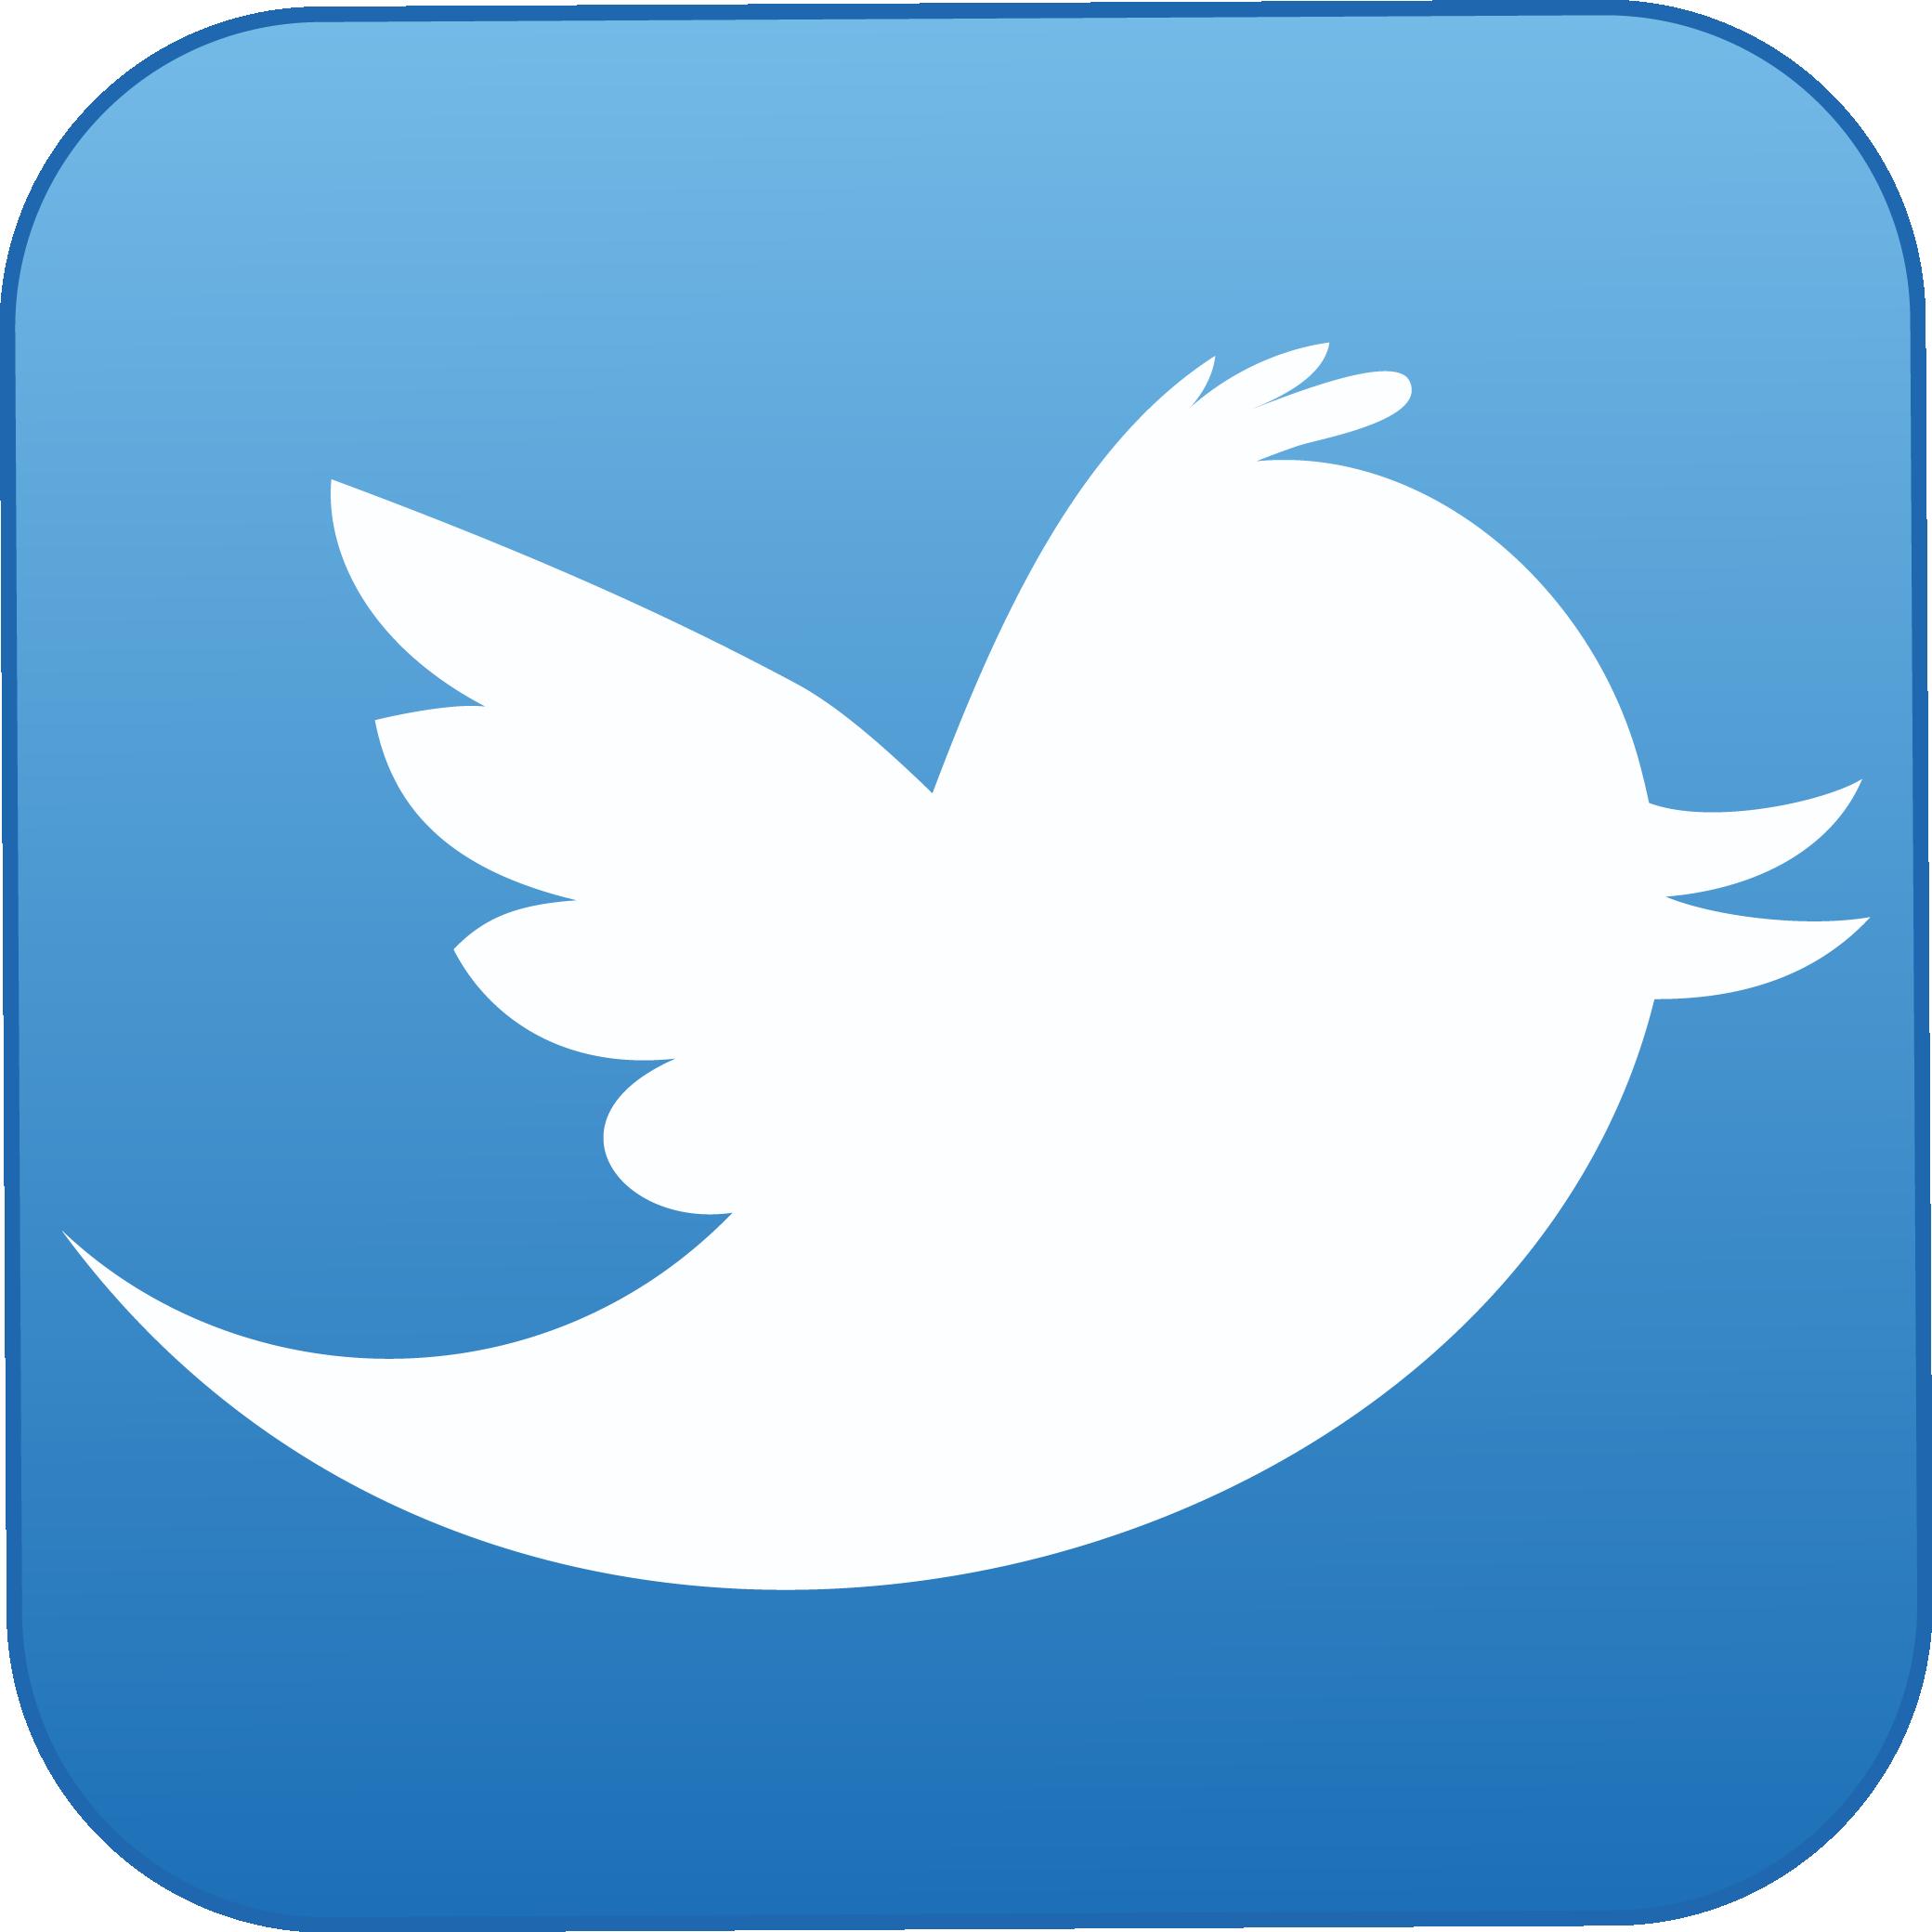 Оптторг в twitter (твитер, твиттер)